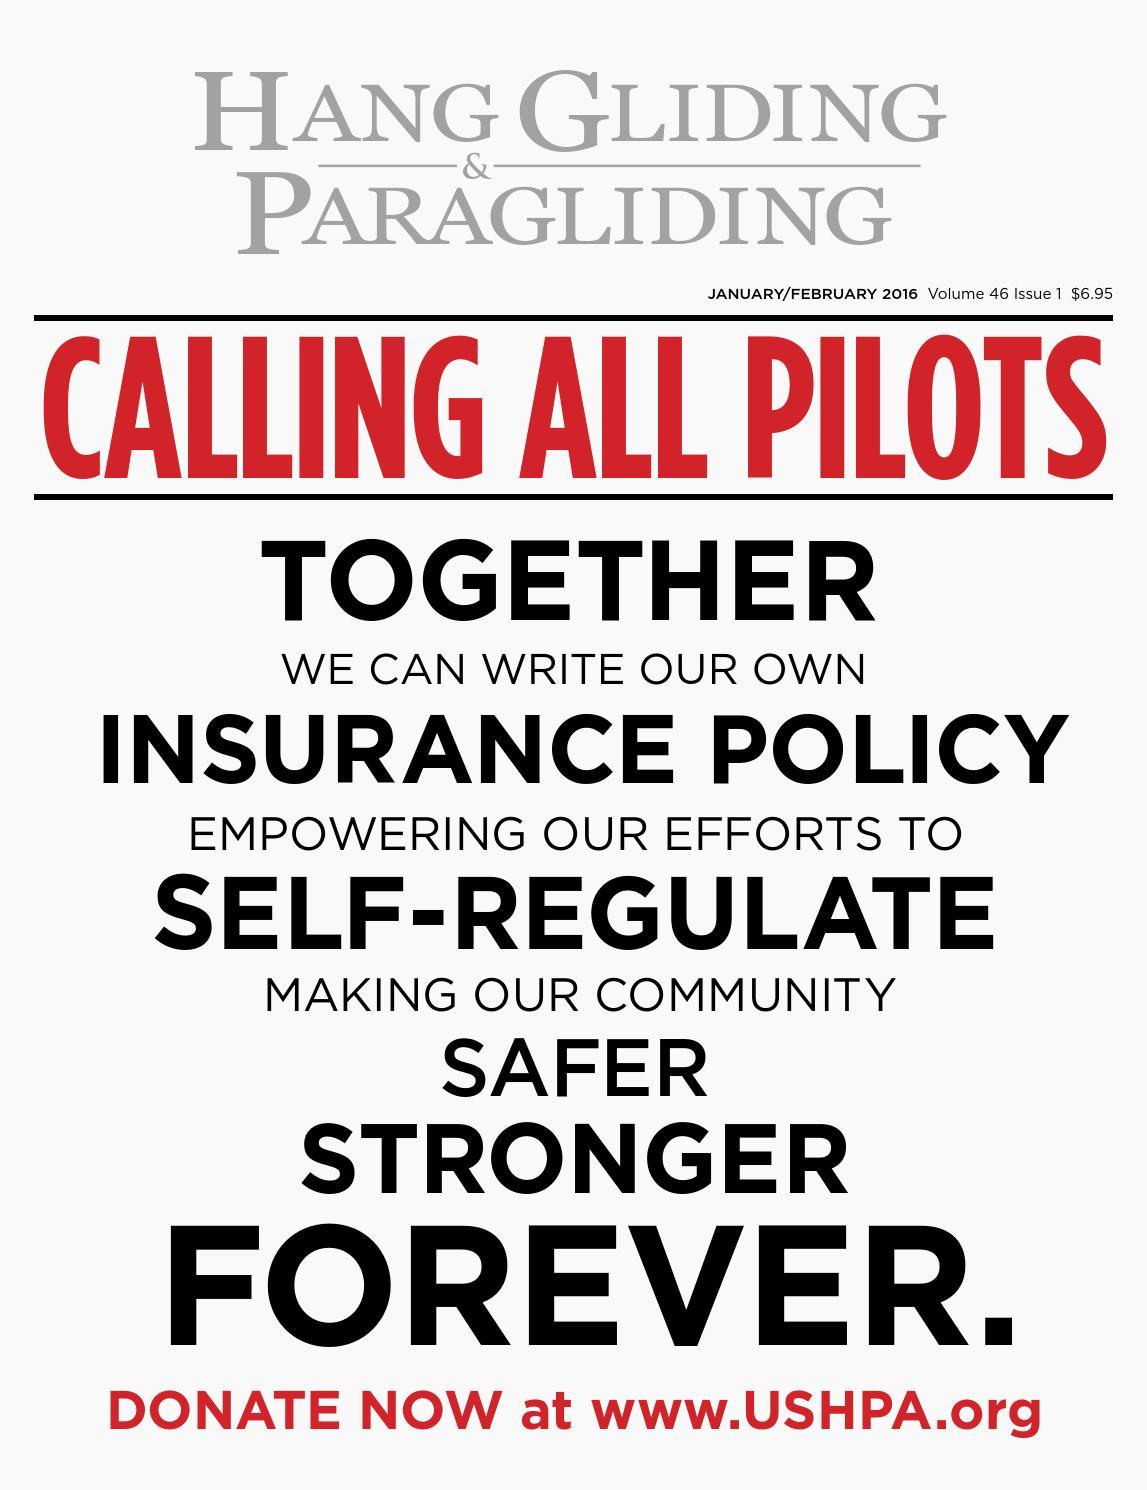 Hang Gliding & Paragliding Vol46-Iss1 Jan-Feb 2016 by US Hang ...